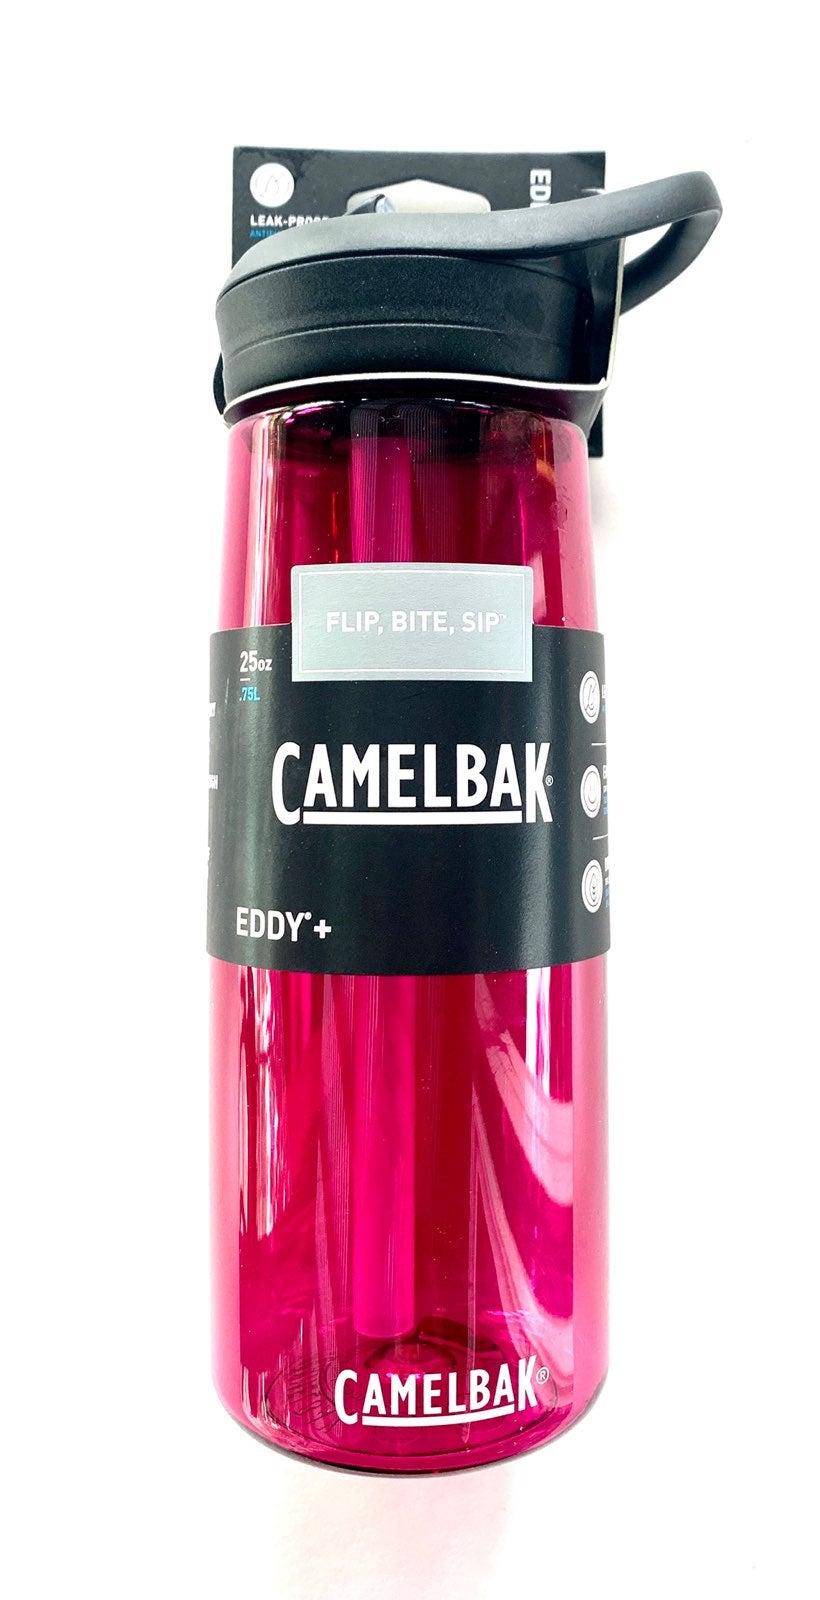 Camelbak Eddie+ .75L Water Bottle